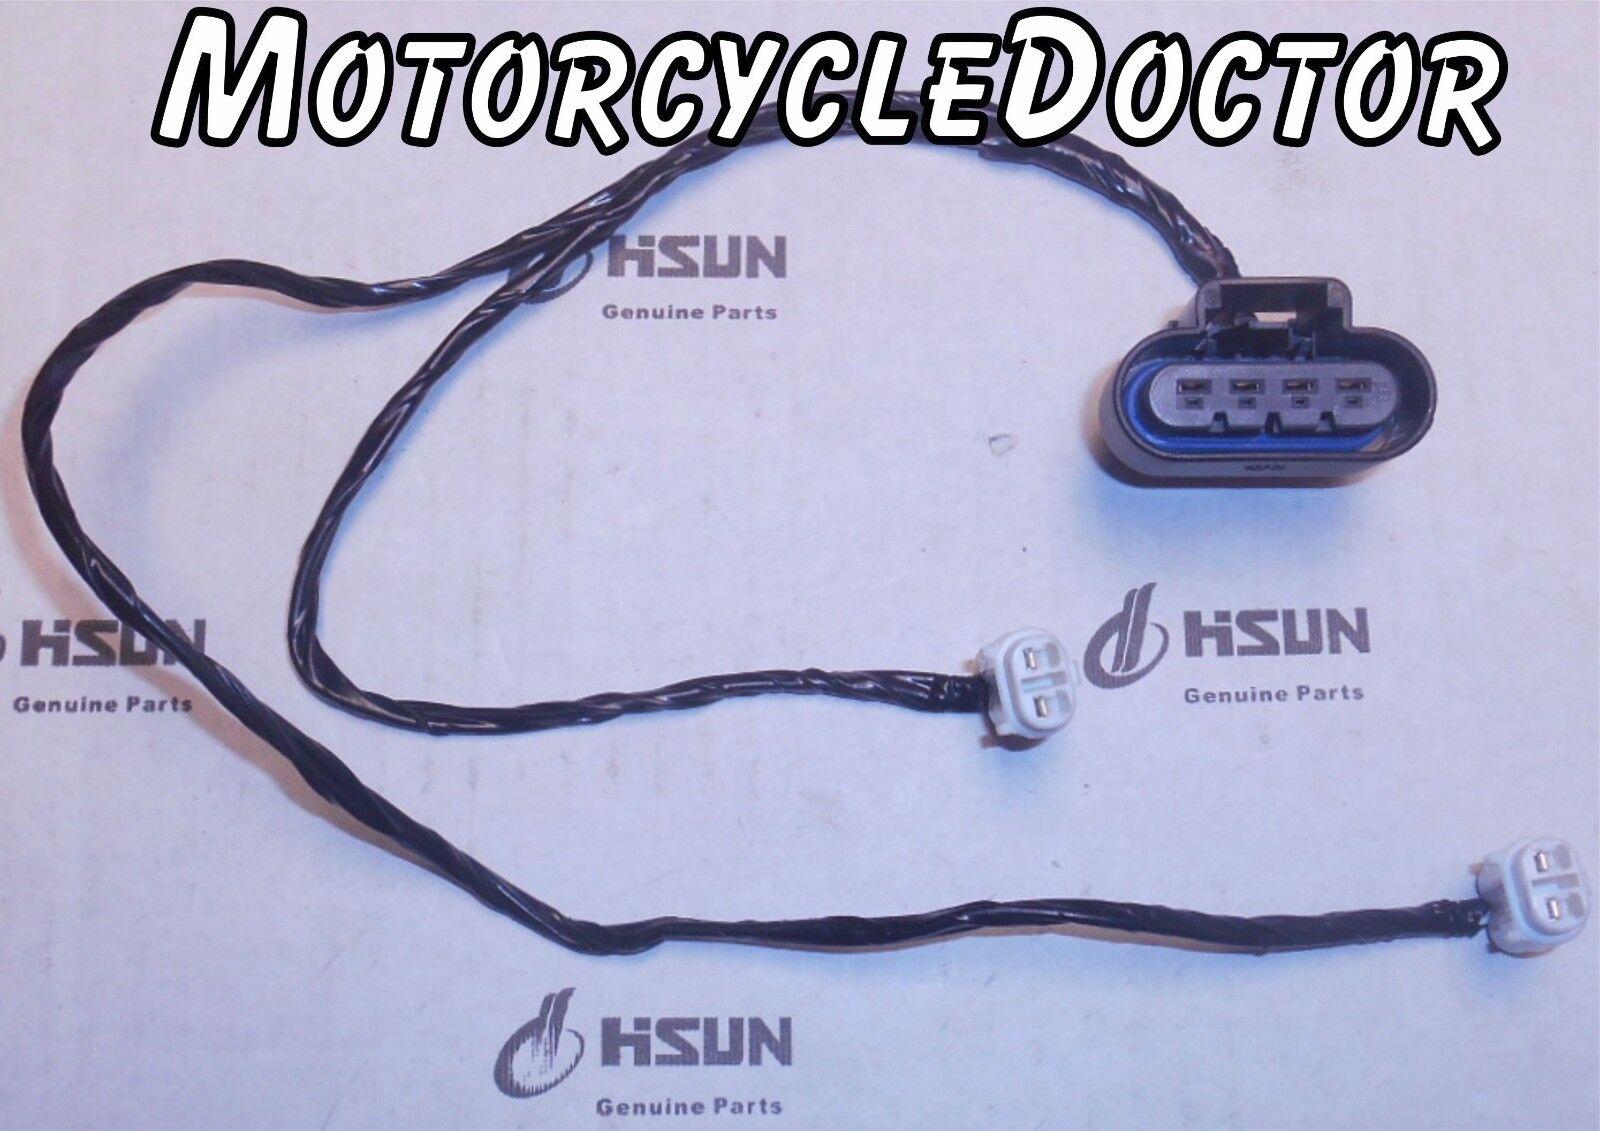 Fuel Pump,Wire,Harness,EFI,MSU,UTV,800,700,500,HiSUN